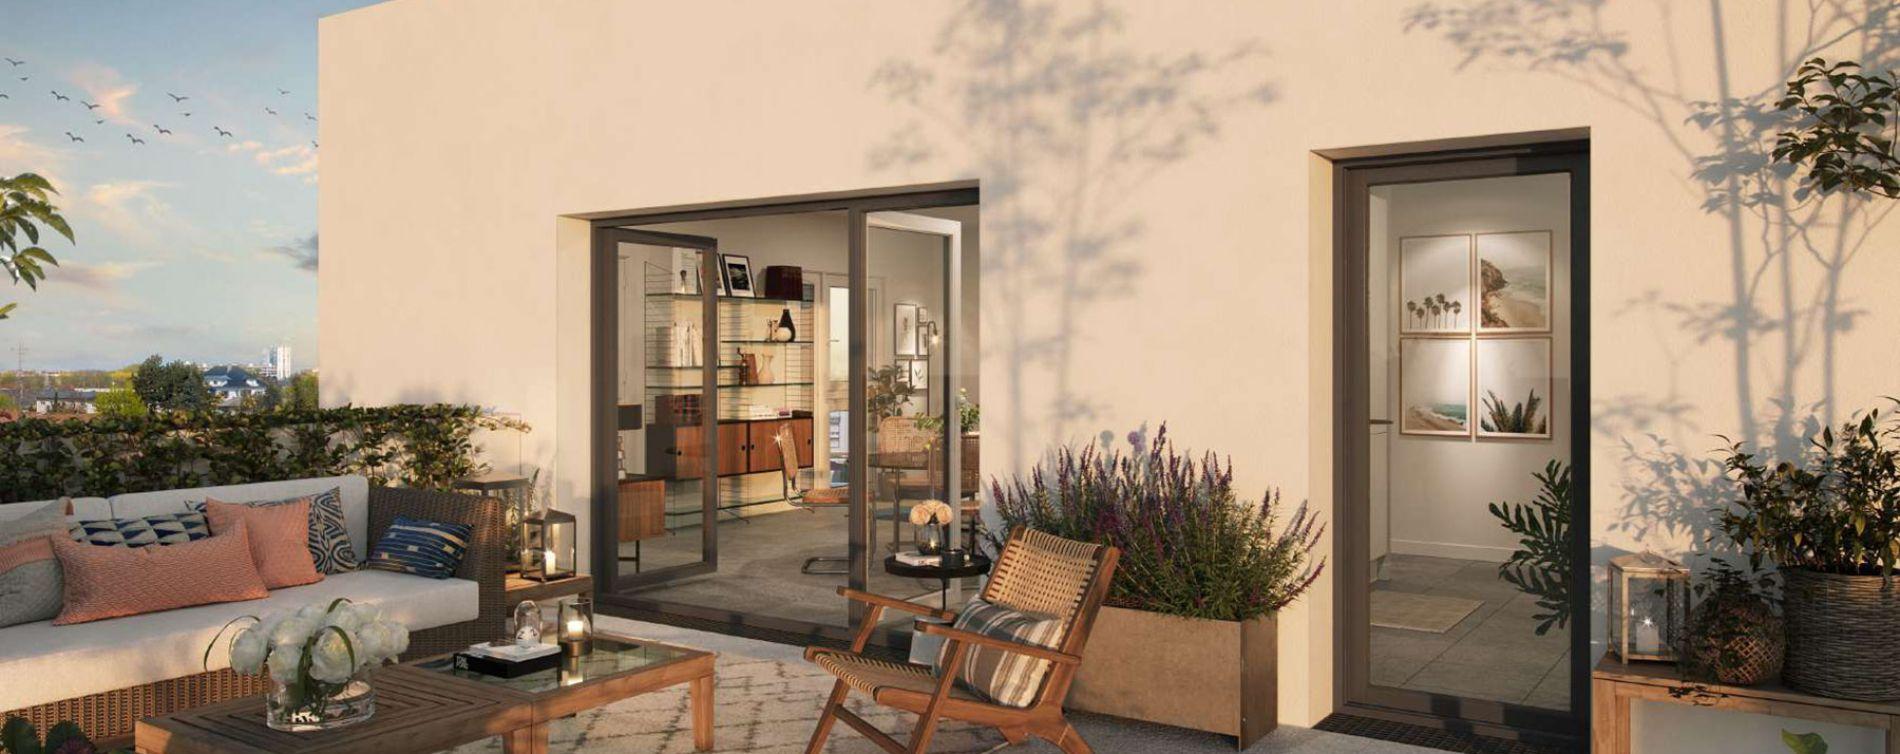 Limoges : programme immobilier neuve « Grand Angle » en Loi Pinel